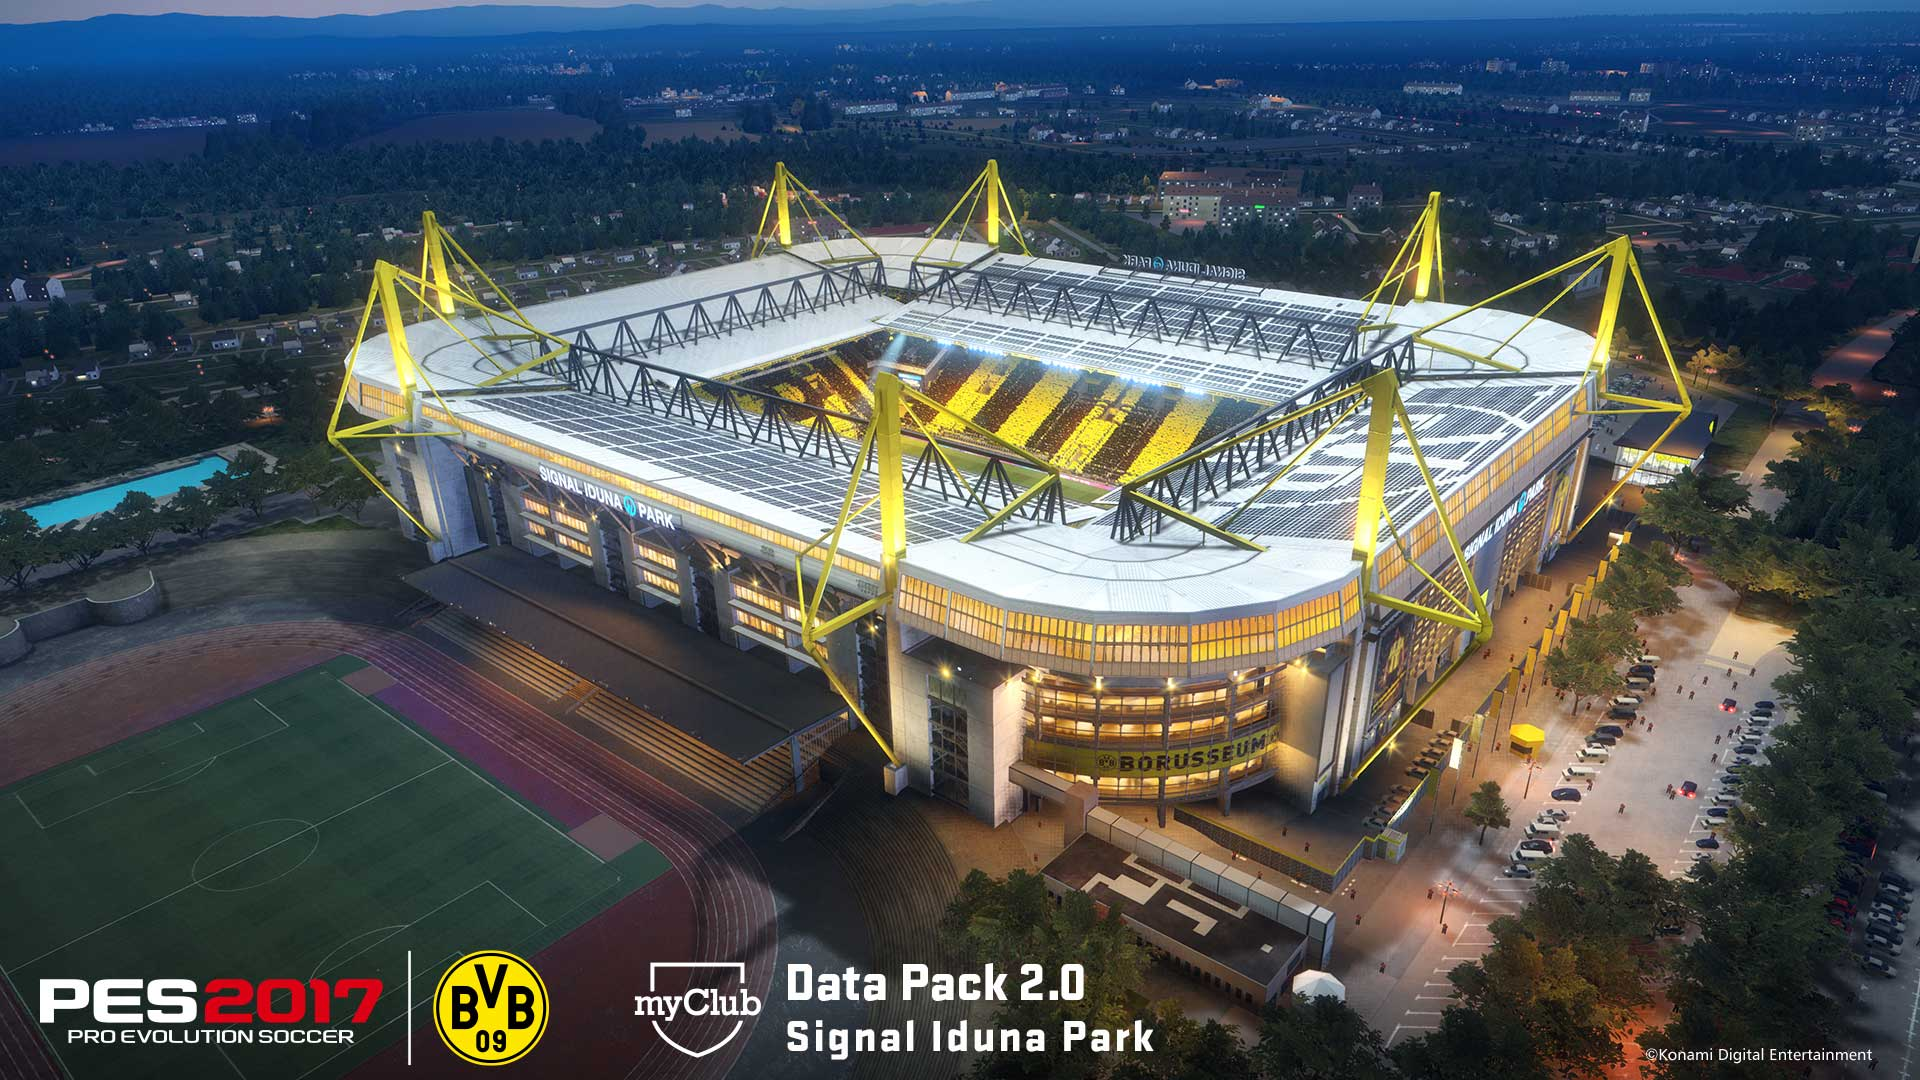 Data Pack 2.0 - Dortmund Stadium Signal Iduna Park